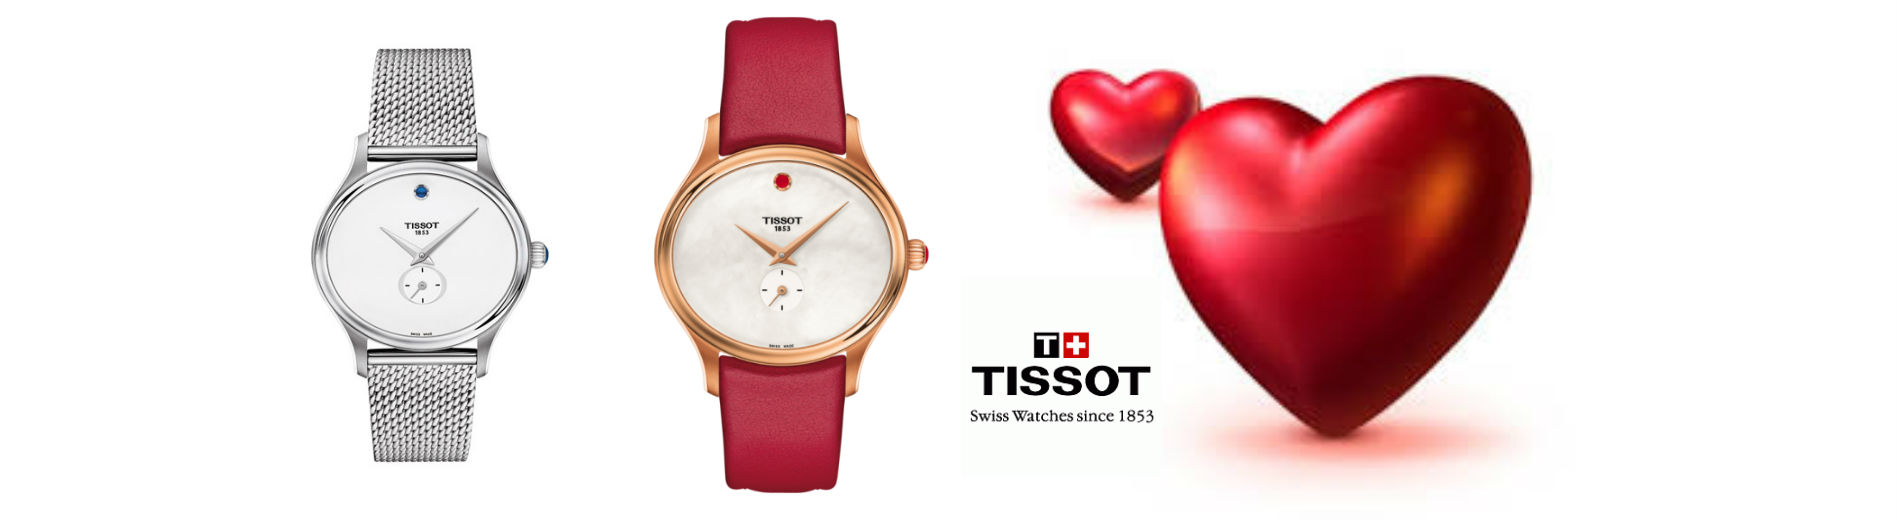 Tissot-bella-ora